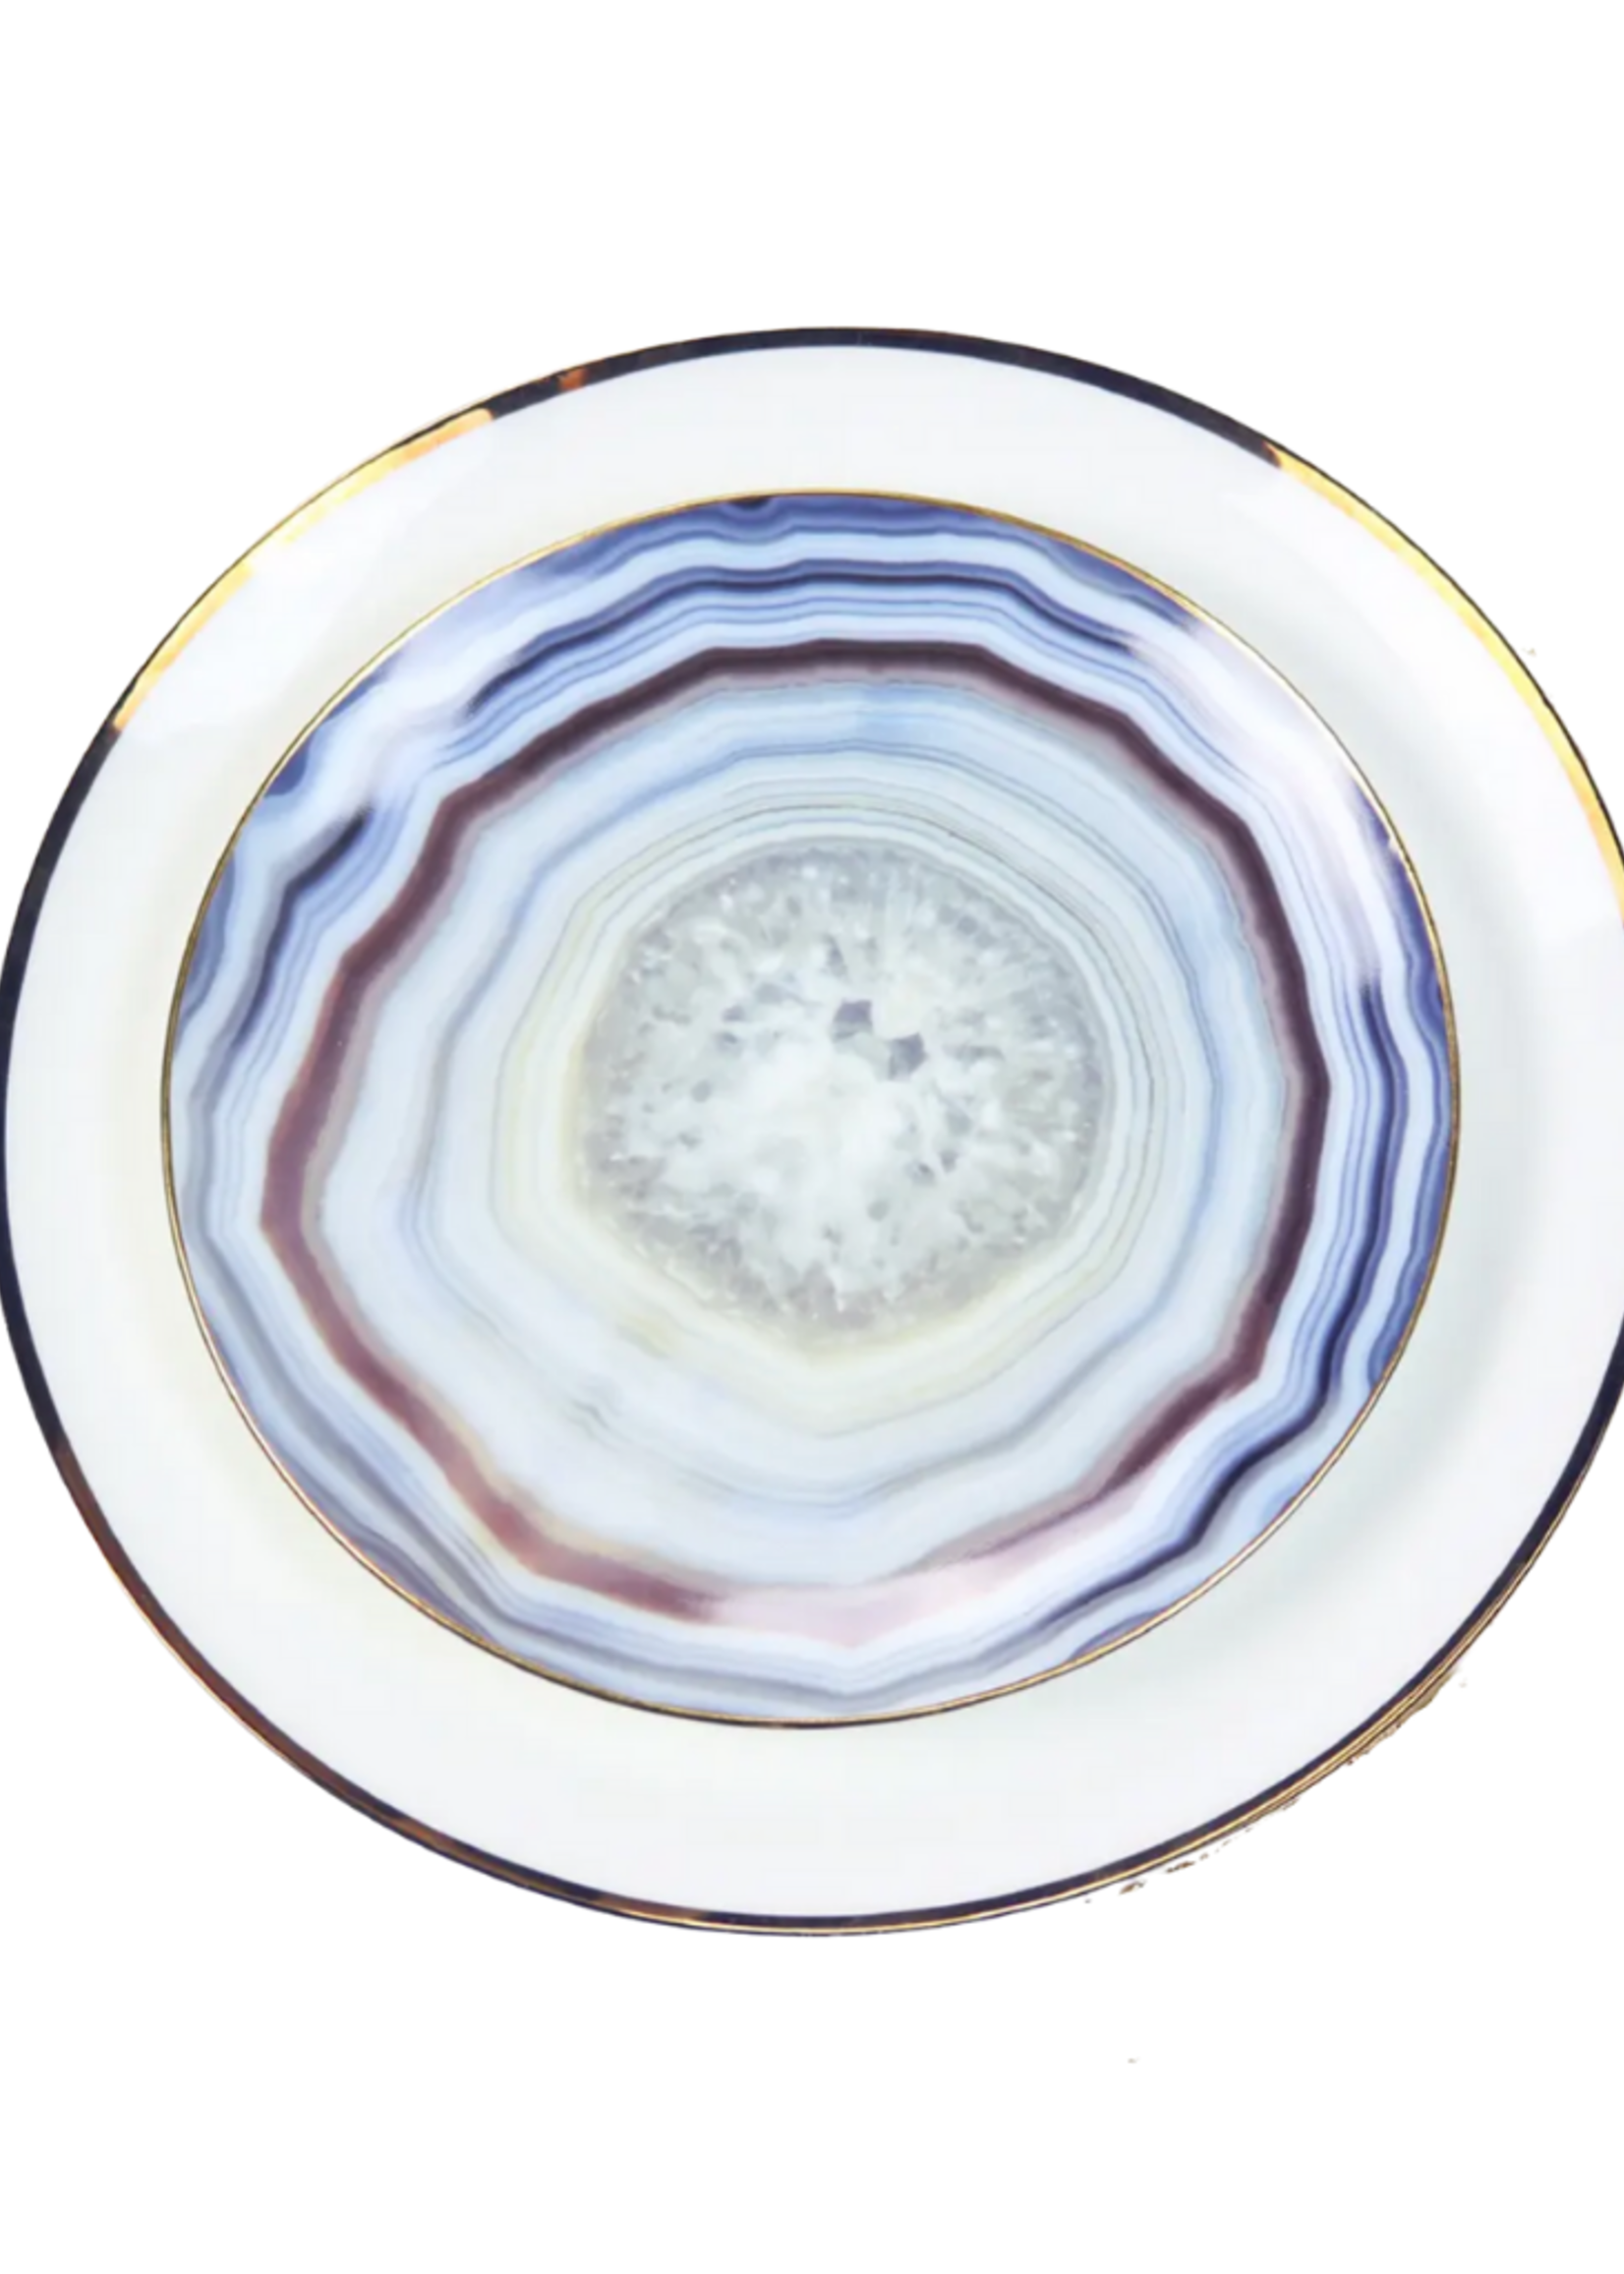 Blue Agate Salad Plate // Set of 4